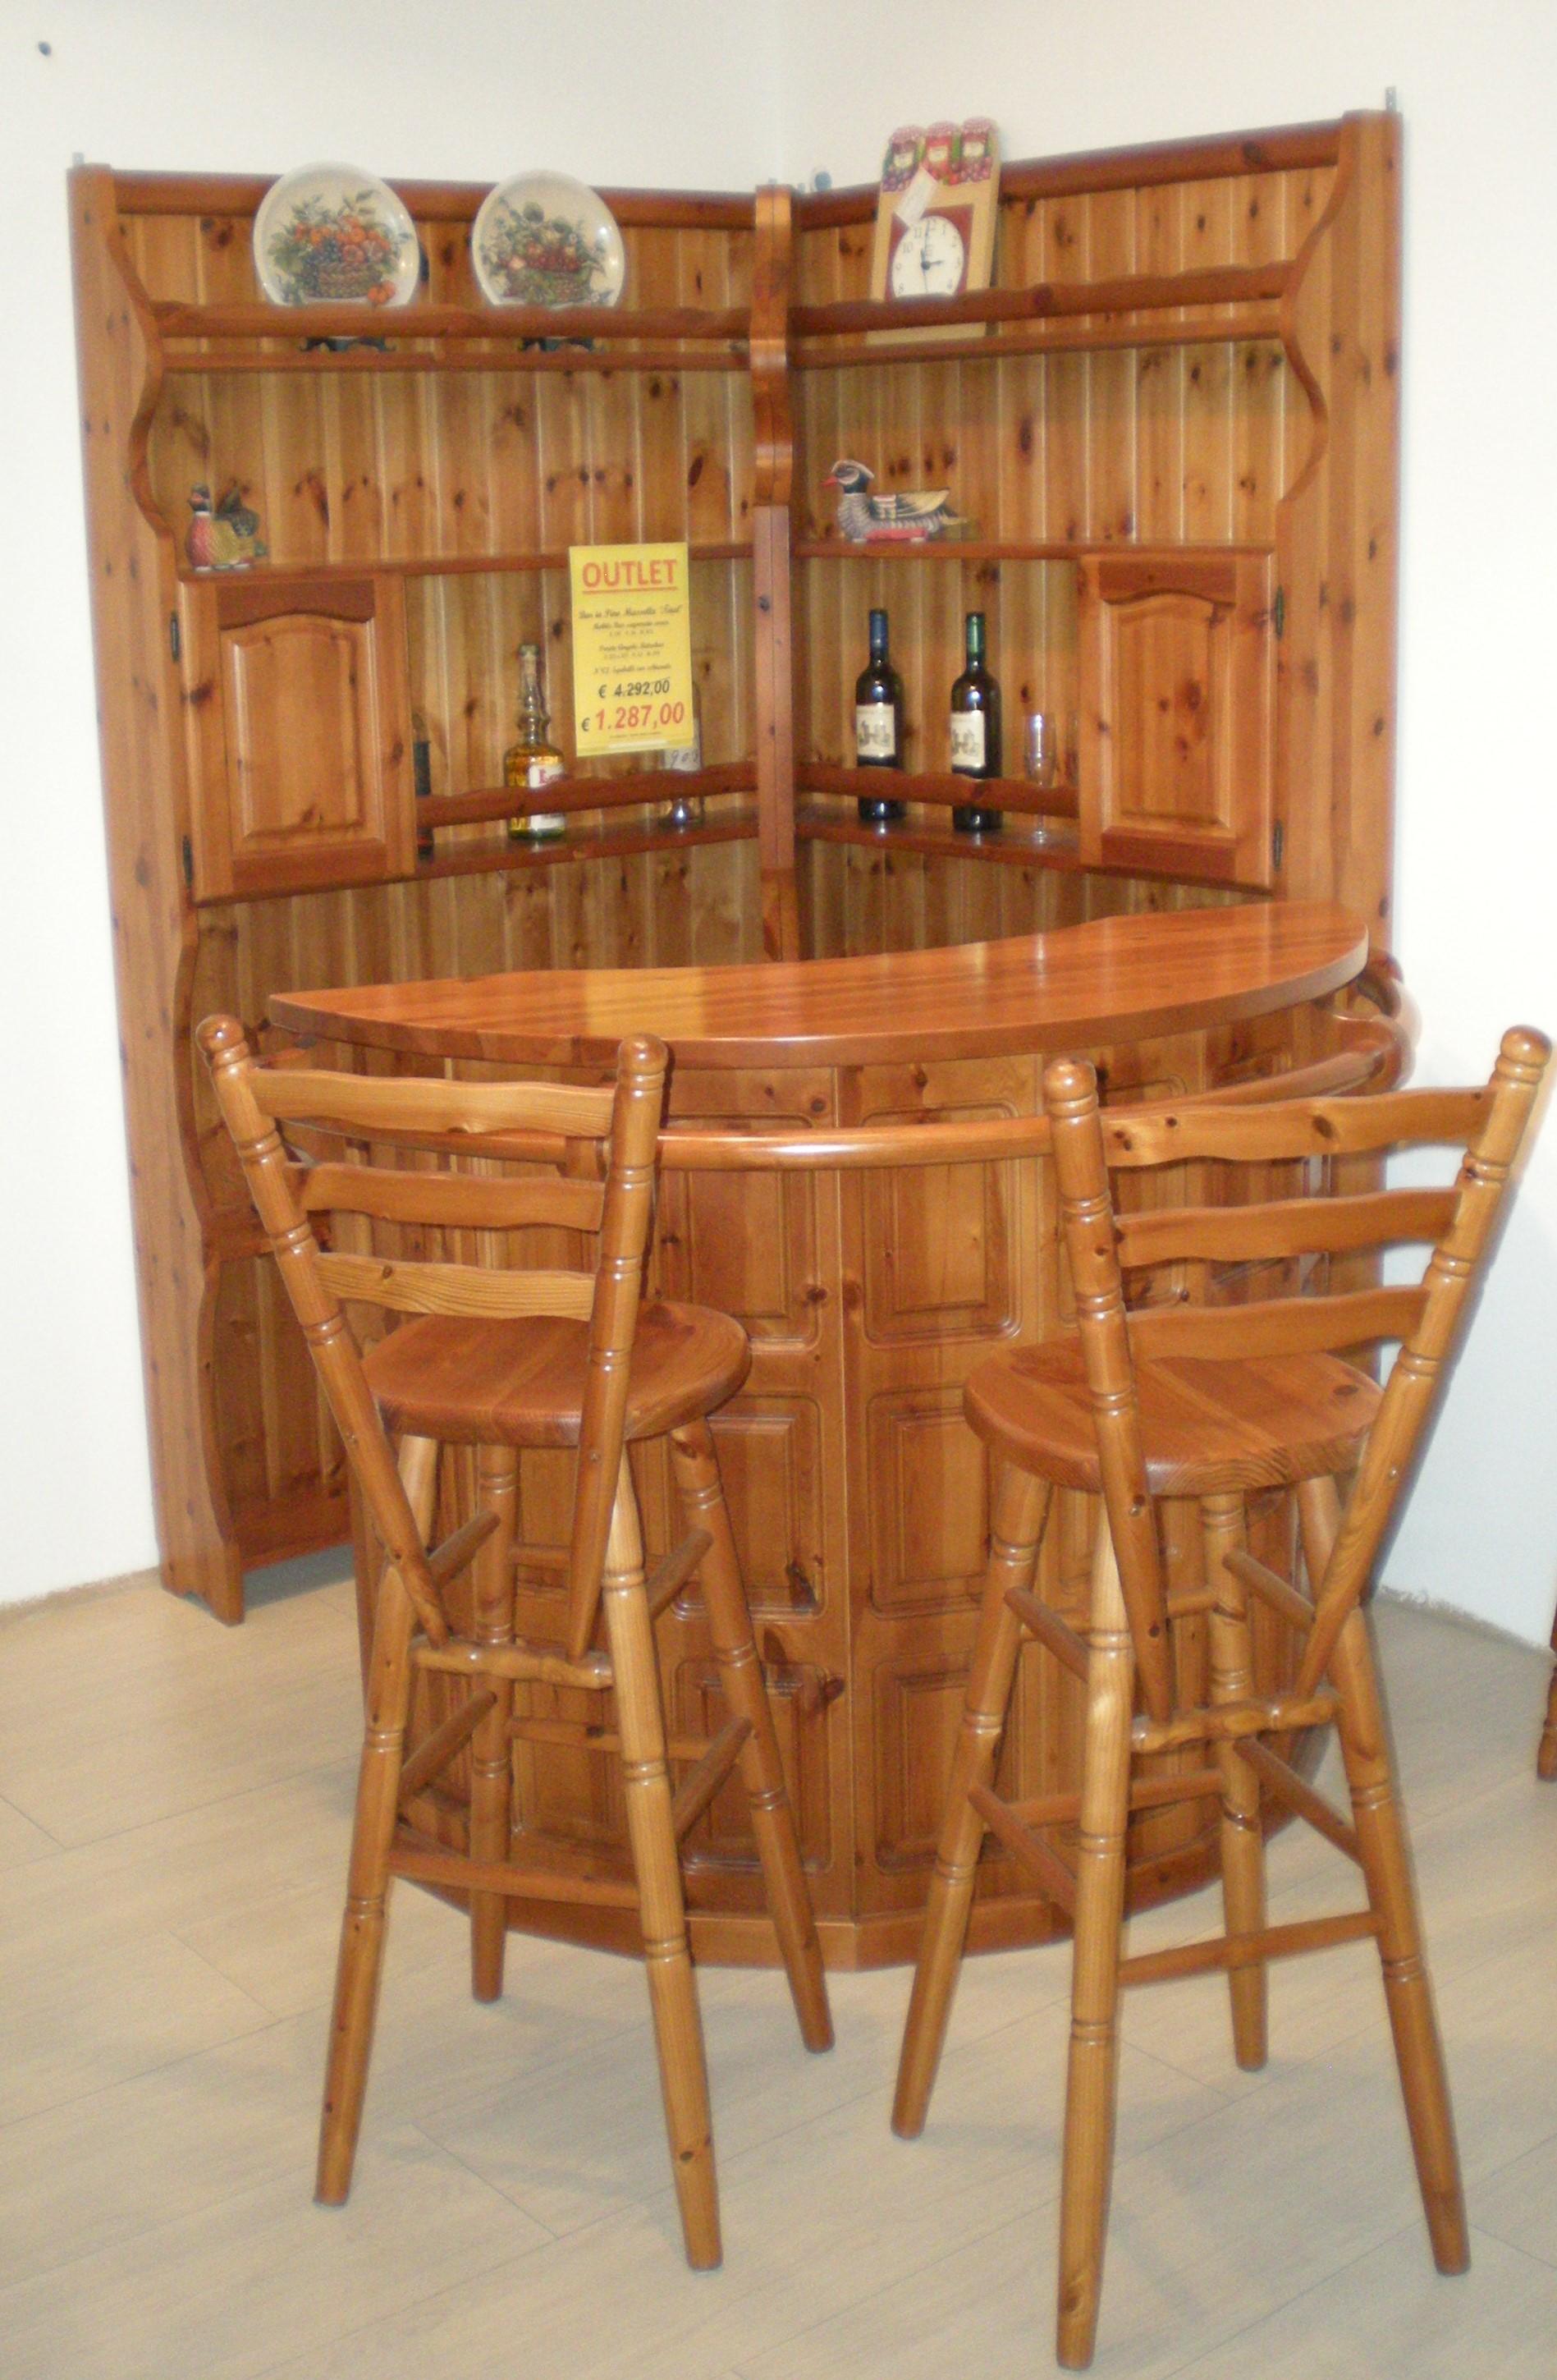 Quadri per cucina moderna - Ingrosso mobili ...